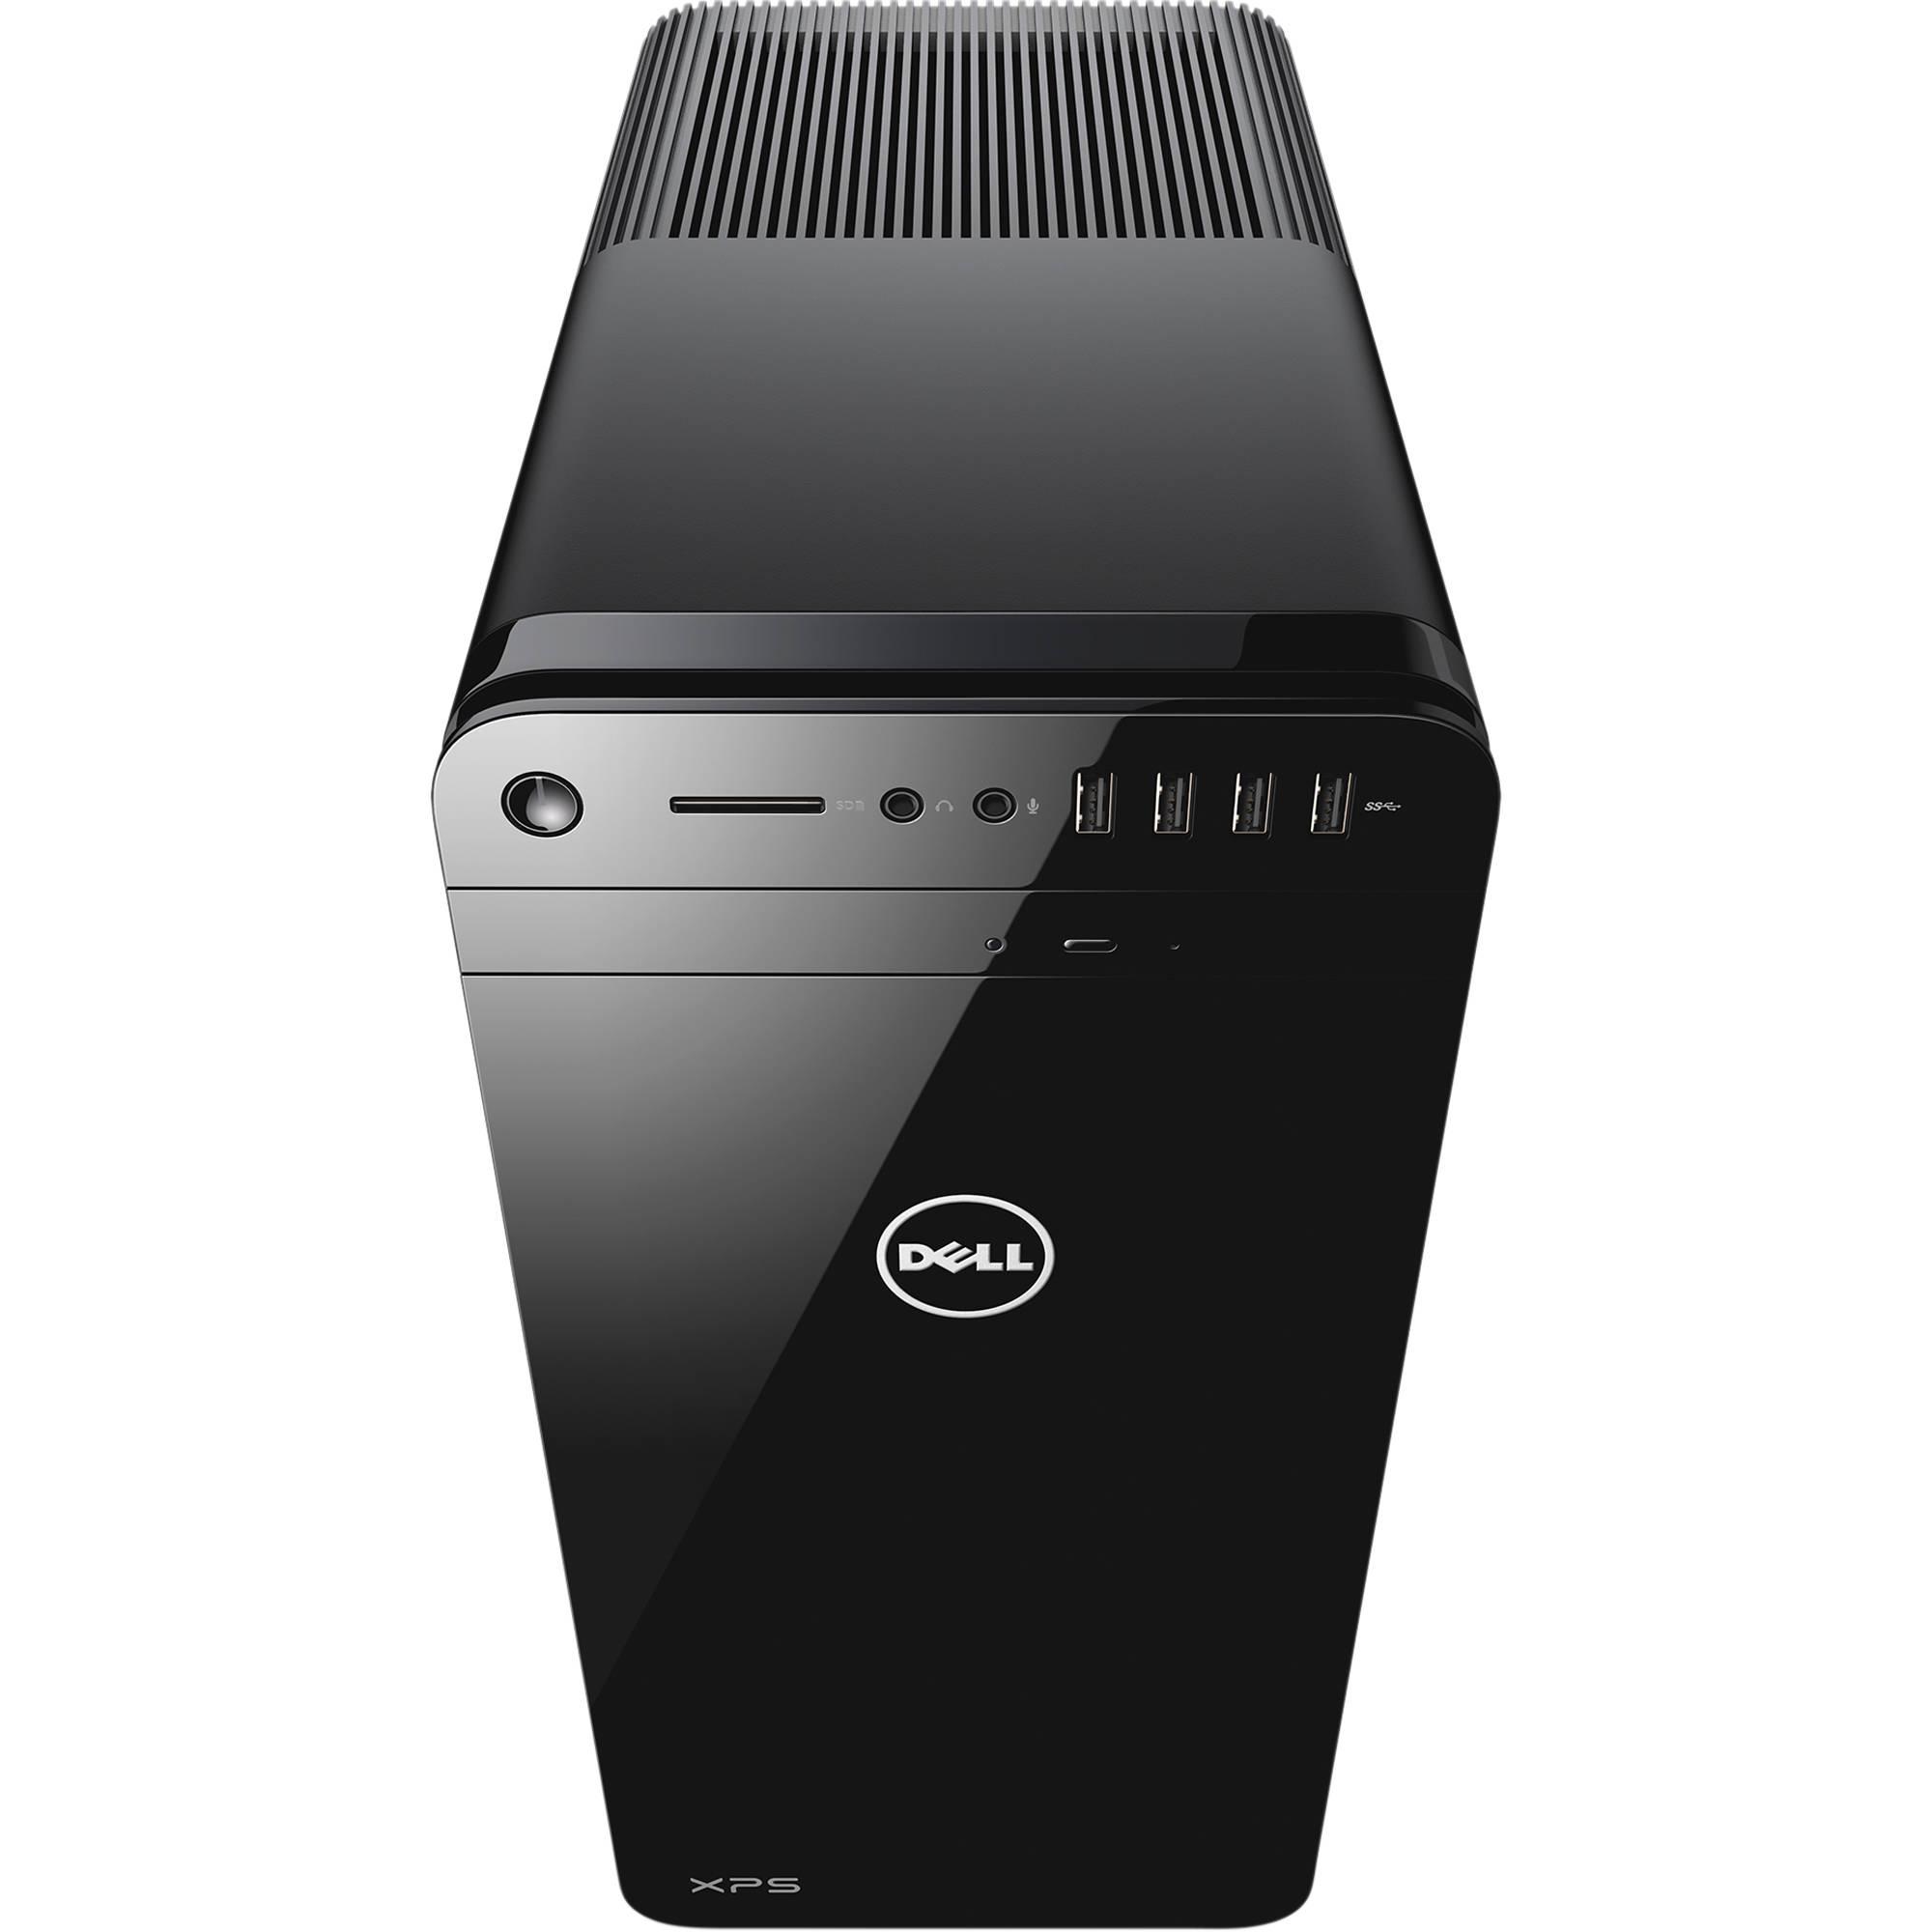 Enjoyable Dell Xps 8910 Desktop Computer Download Free Architecture Designs Meptaeticmadebymaigaardcom